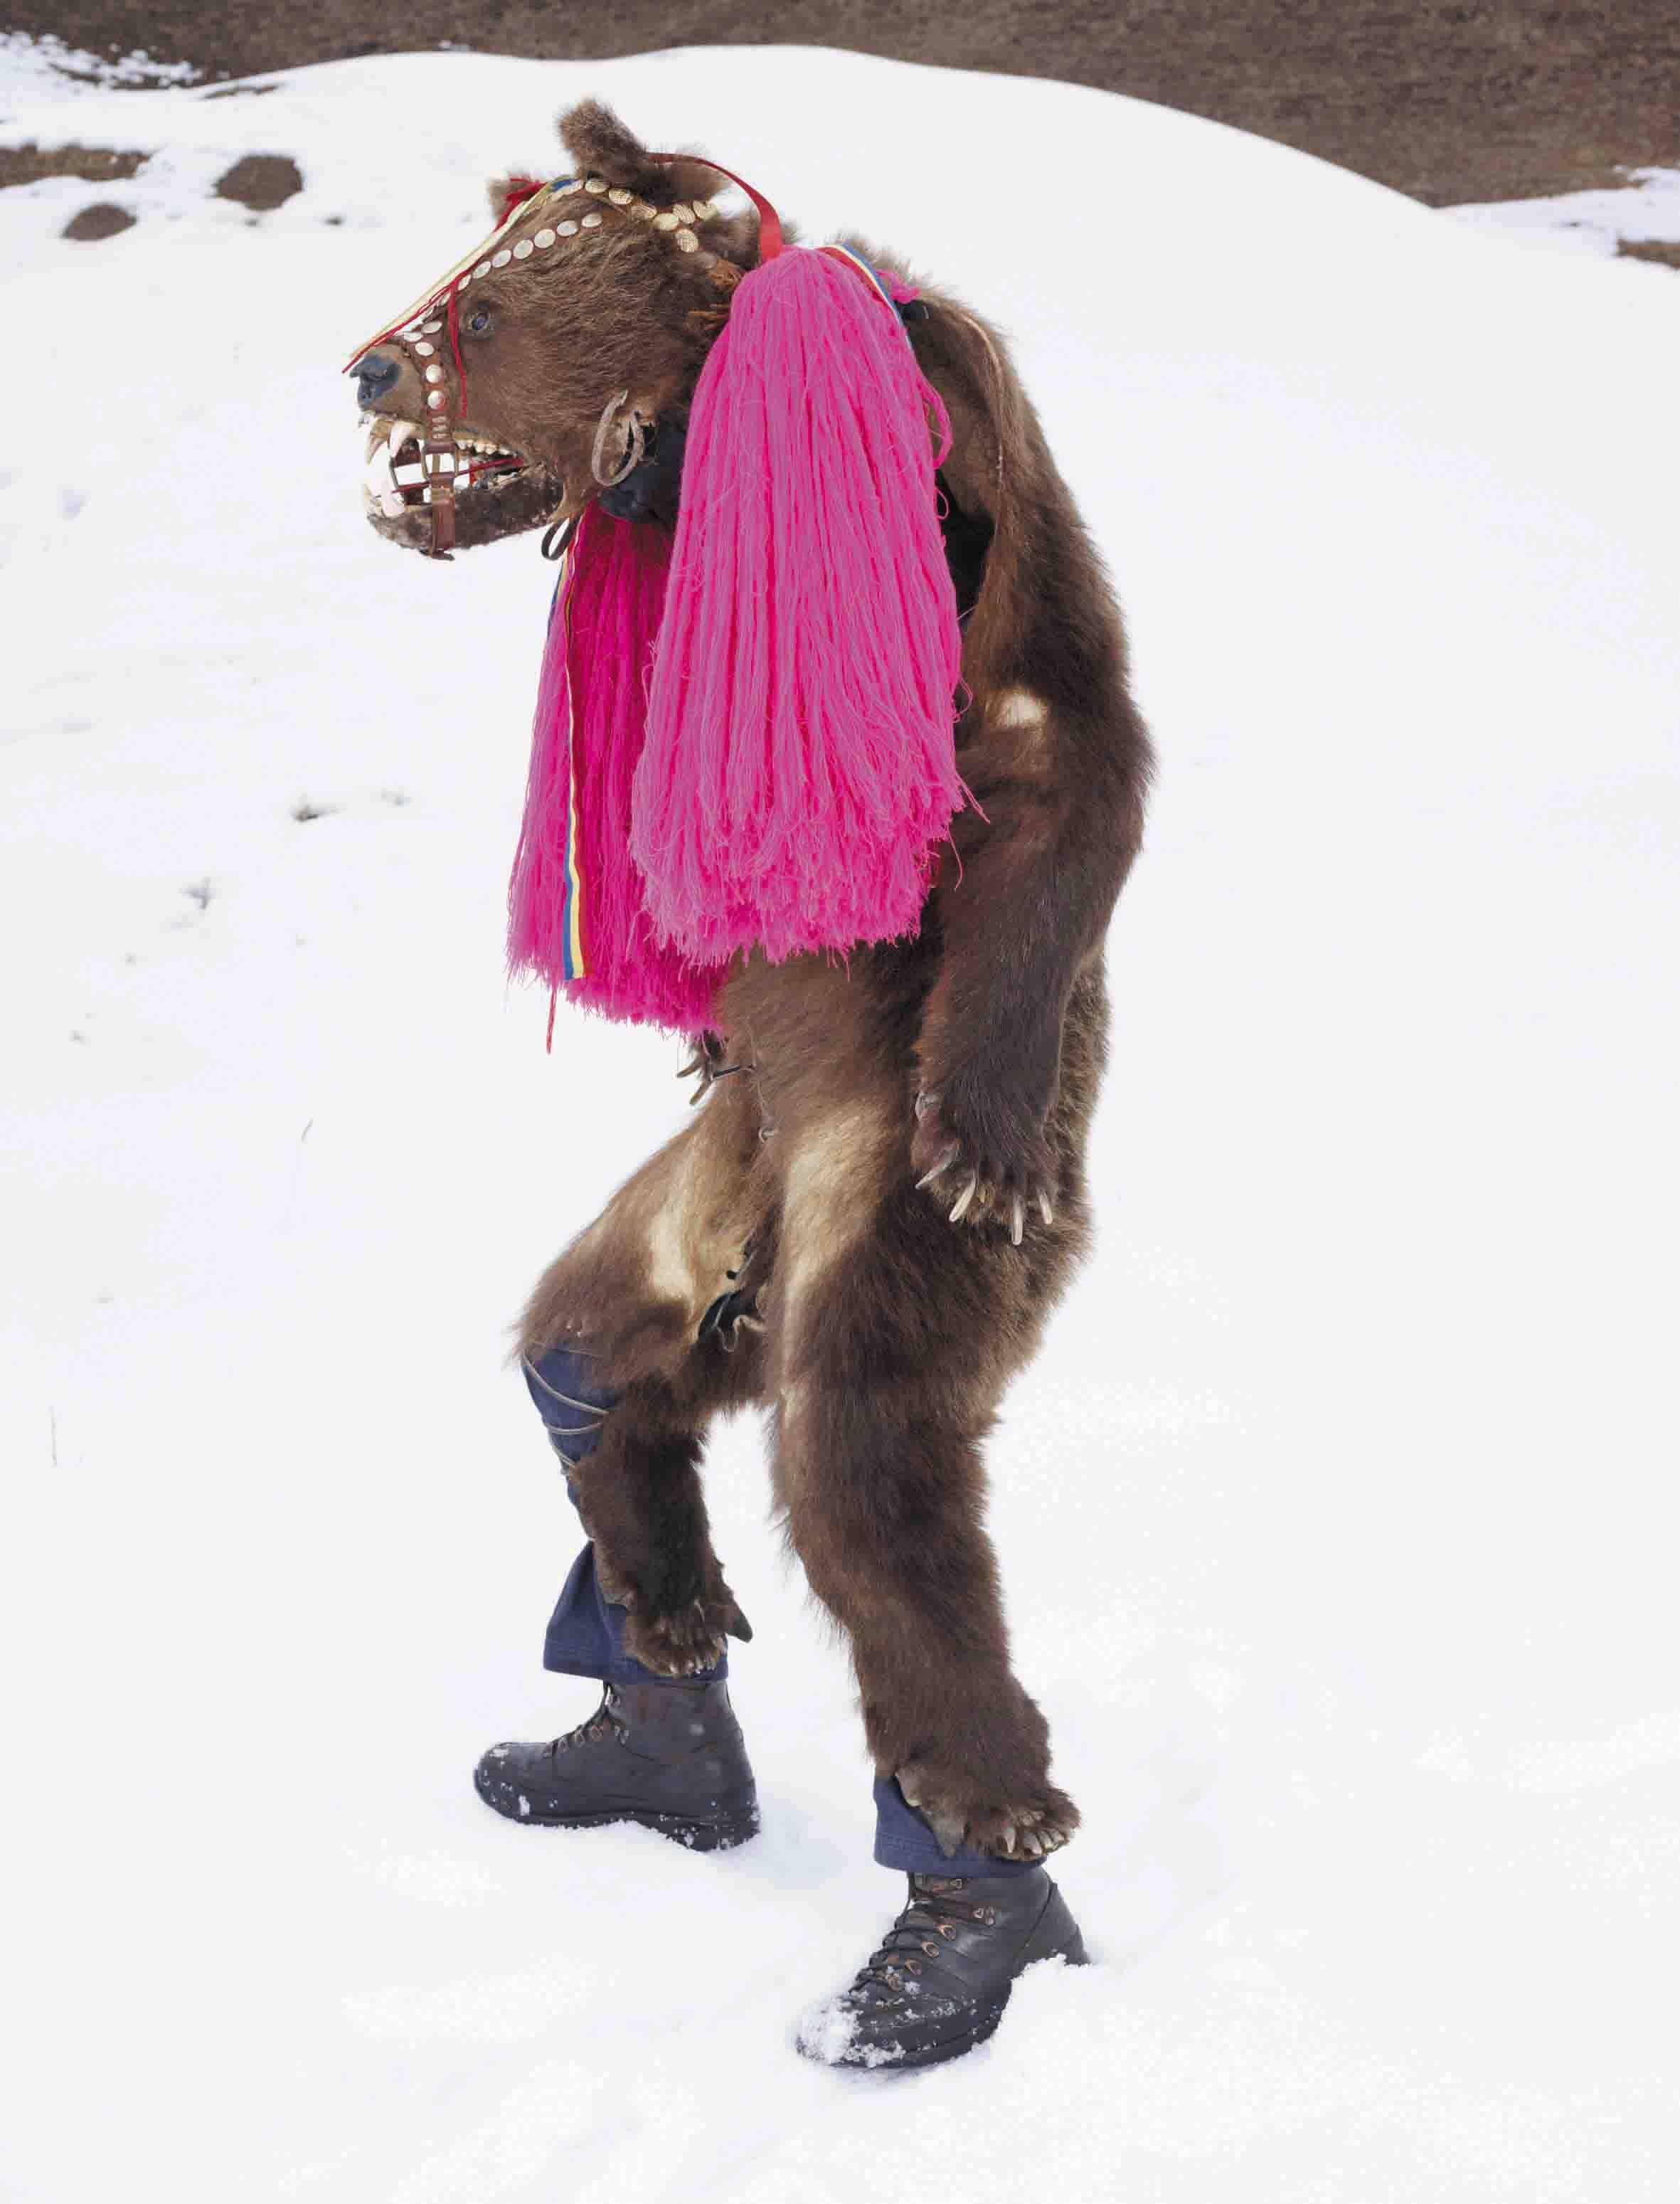 Ursul din Palanca, Romania, Serie WILDER MANN_CHARLES FREGER_2010-2011 (2)